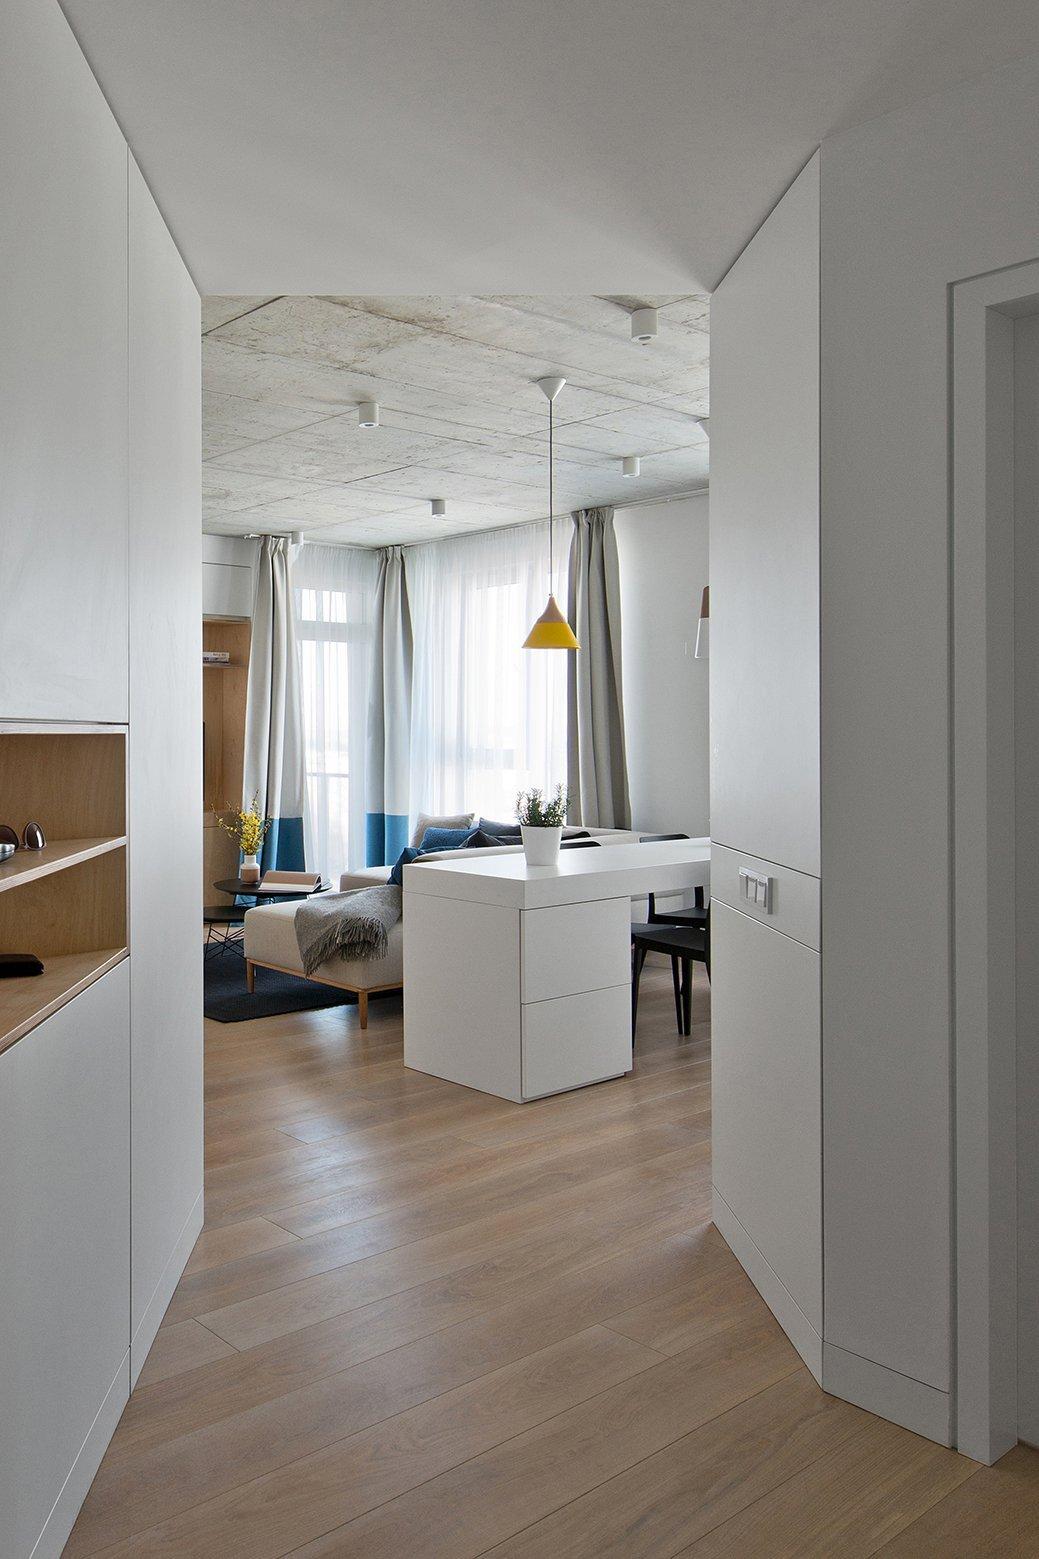 Apartment in Vilnius - Normundas Vilkas - Lithuania - Entry - Humble Homes